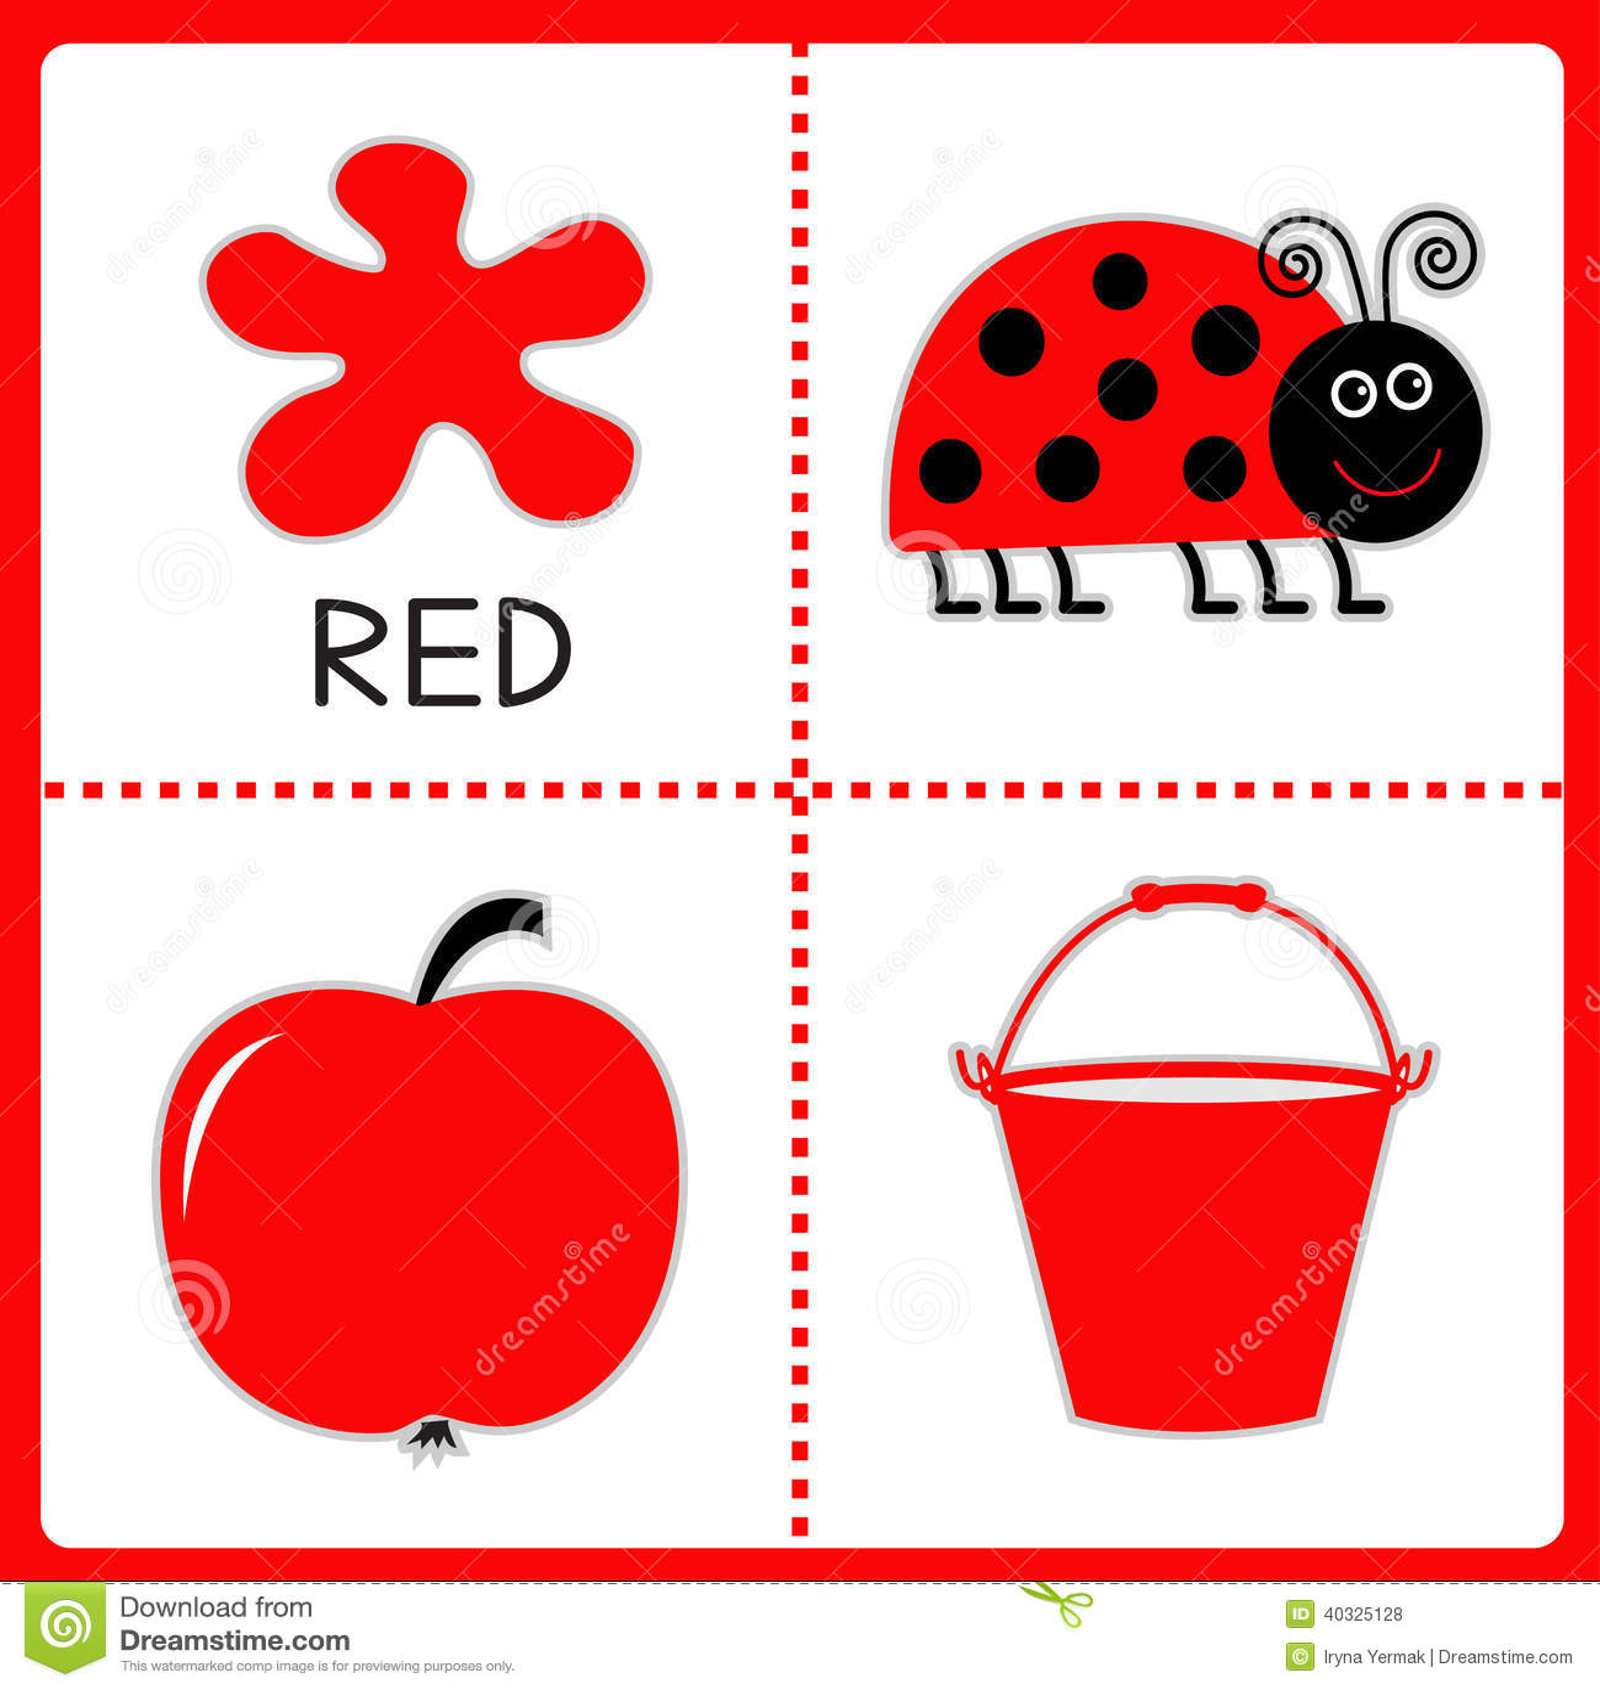 Royalty Free Stock Photos Learning Red Color Ladybug Apple Bucket Educational Cards Kids Vector Illustration Image40325128 on Y Worksheets Pre Kindergarten